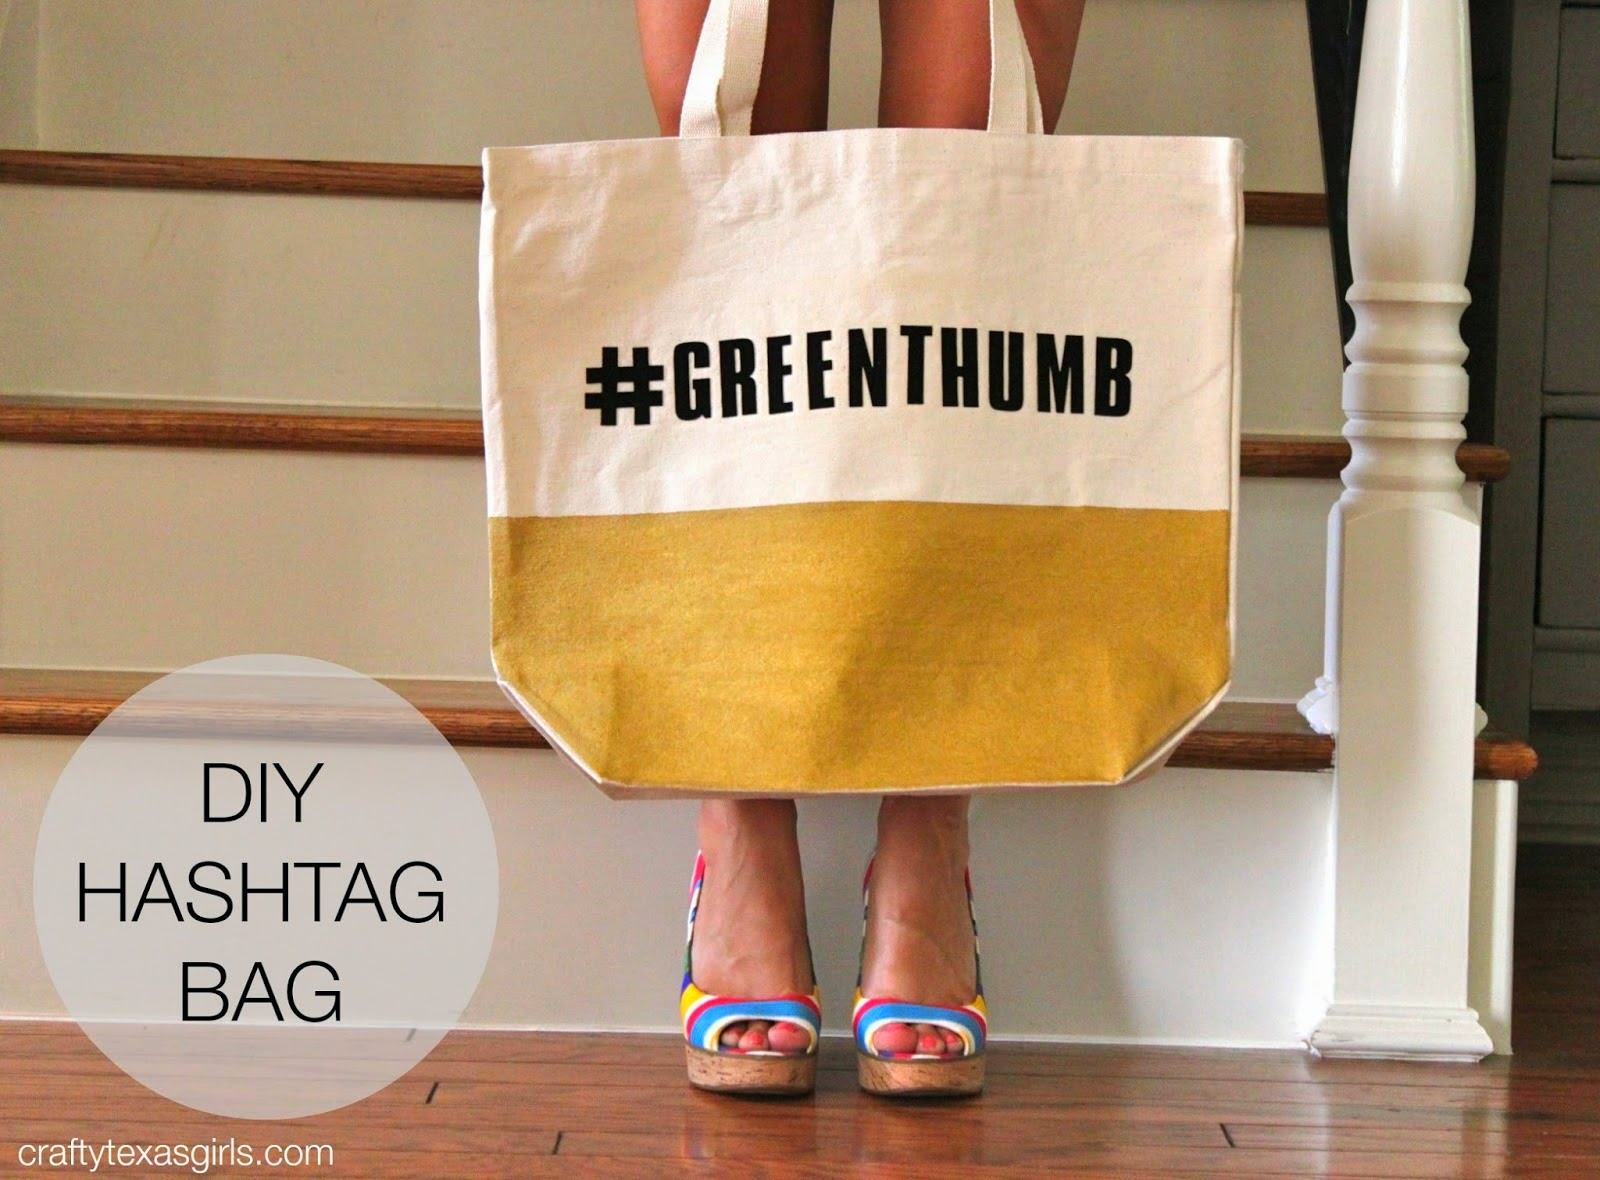 Instagram Hashtag Bag img